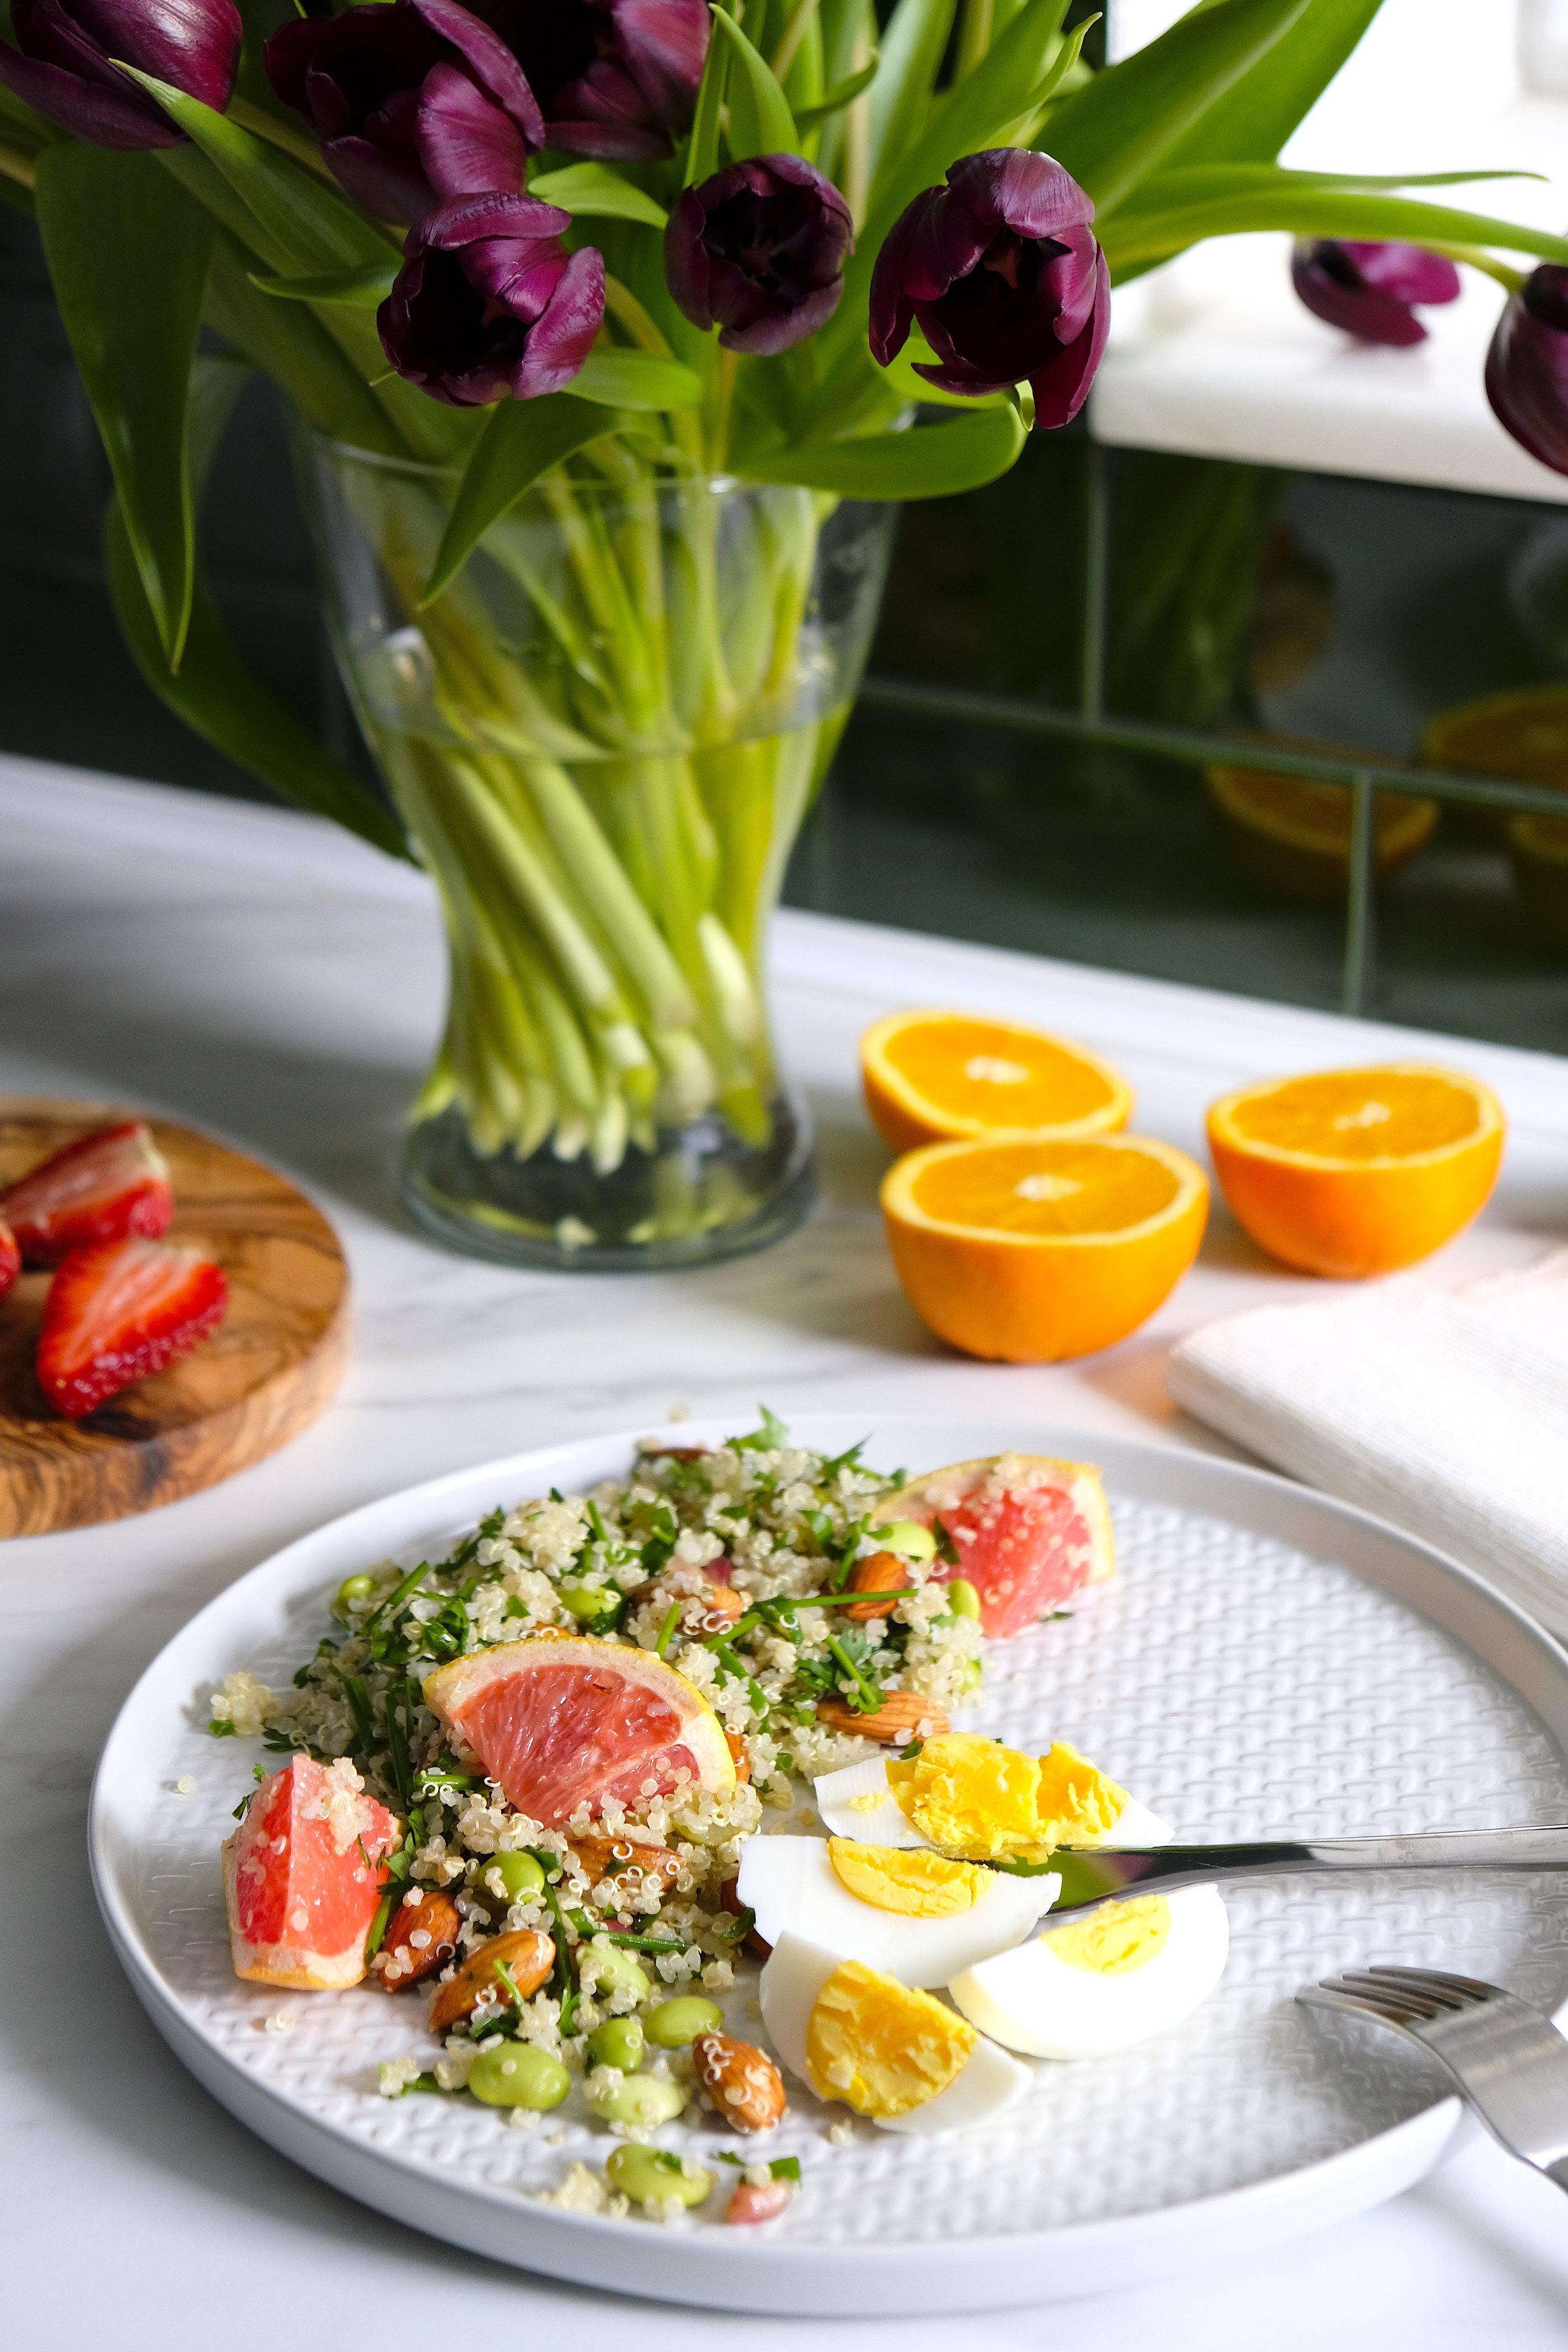 Quinoa cu edamame_salata calda fresh sanatos_The nature Project.JPG